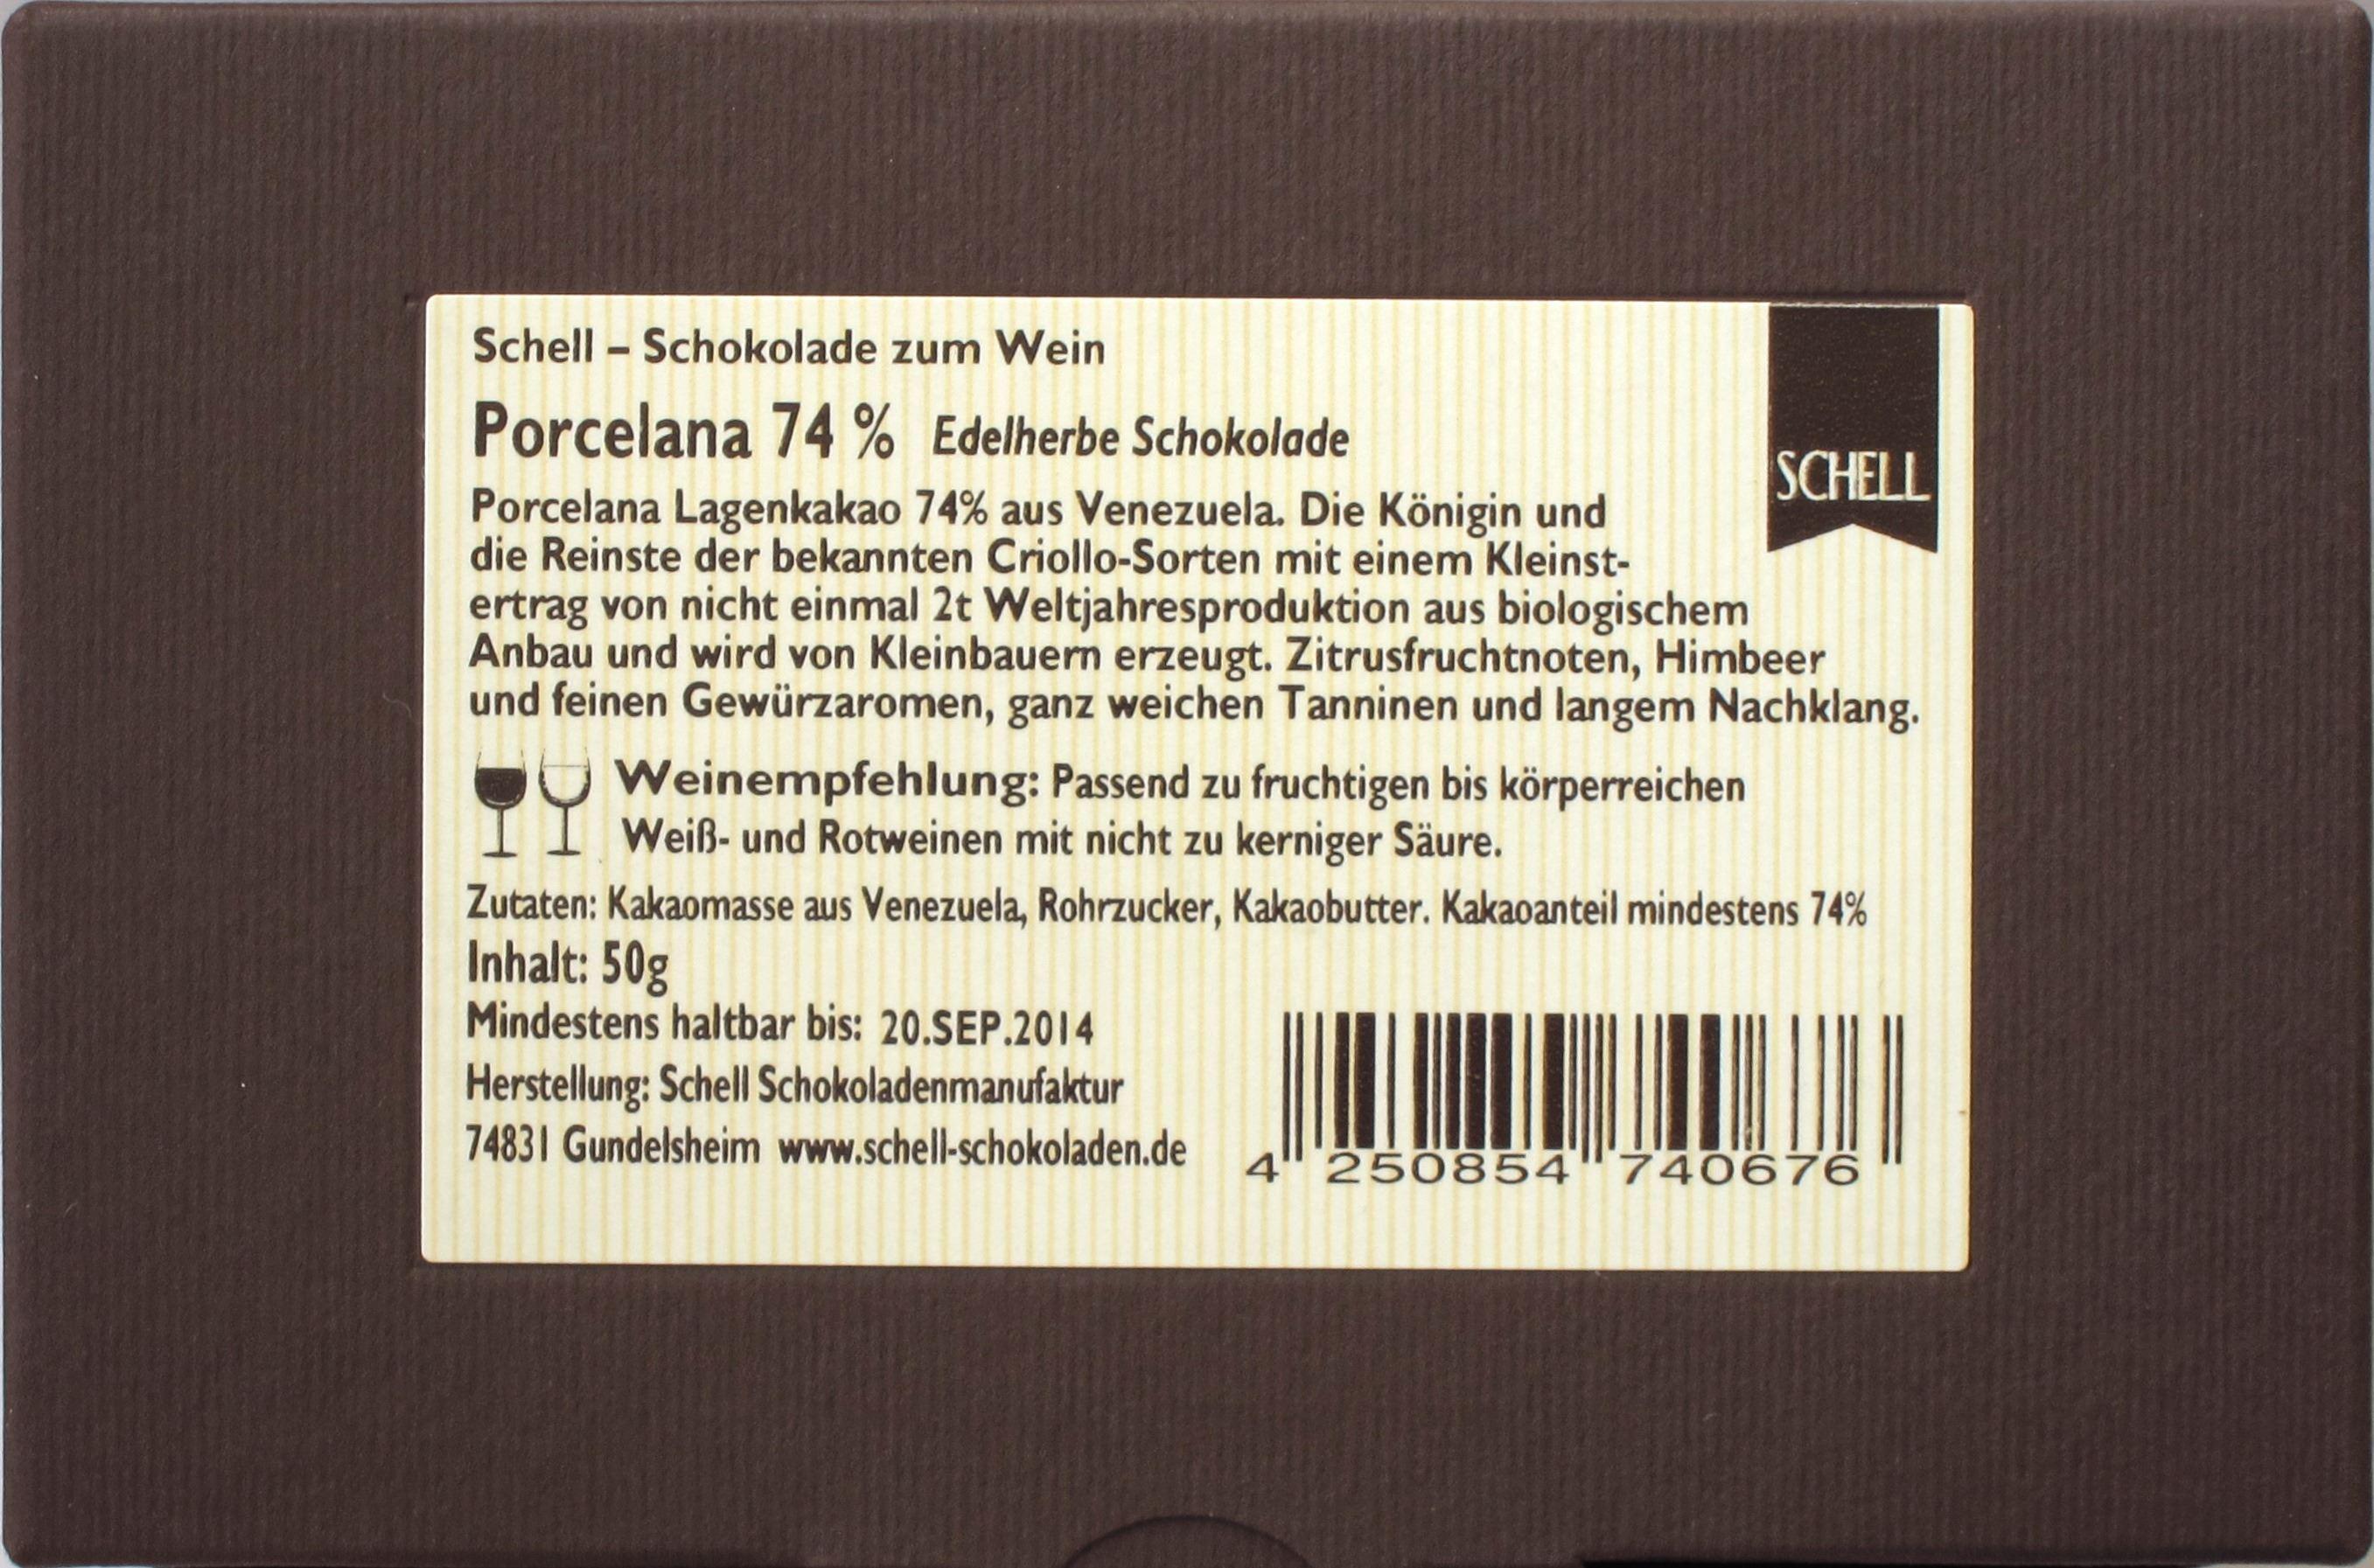 Schell-Schokolade Porcelana 74%, Rückseite